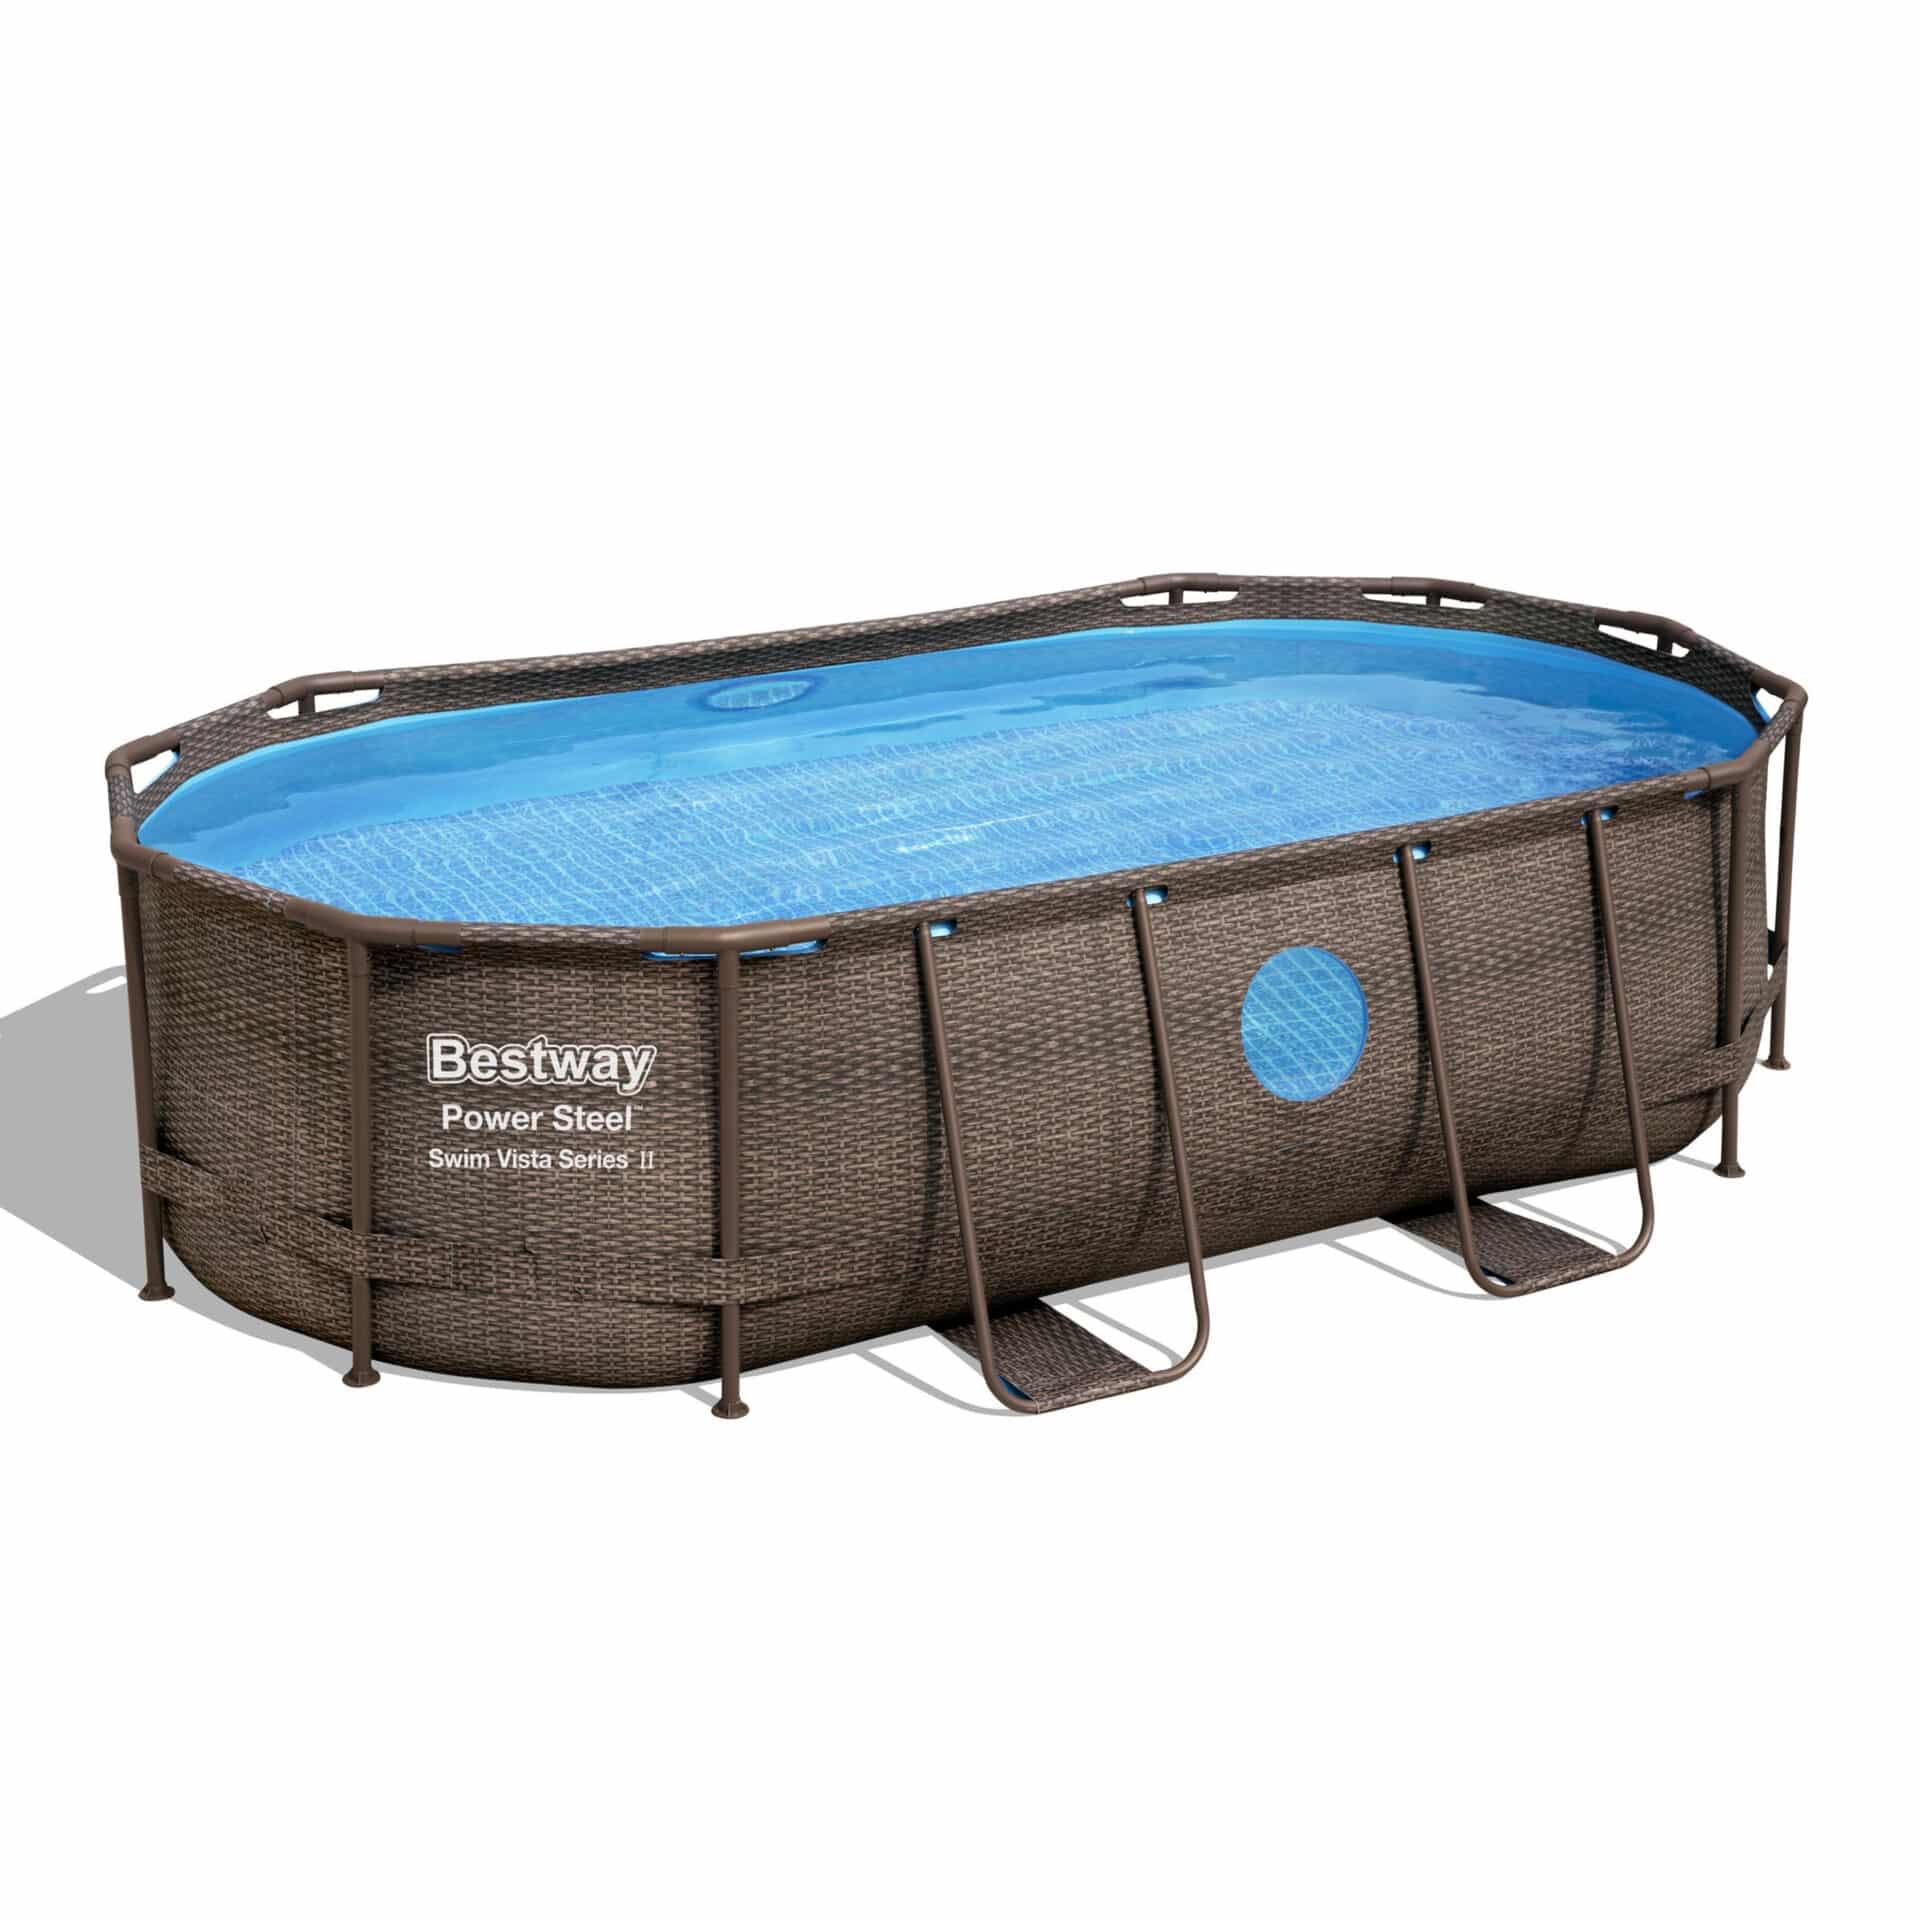 Ovalt Swim Vista R1 bassengsett bestway